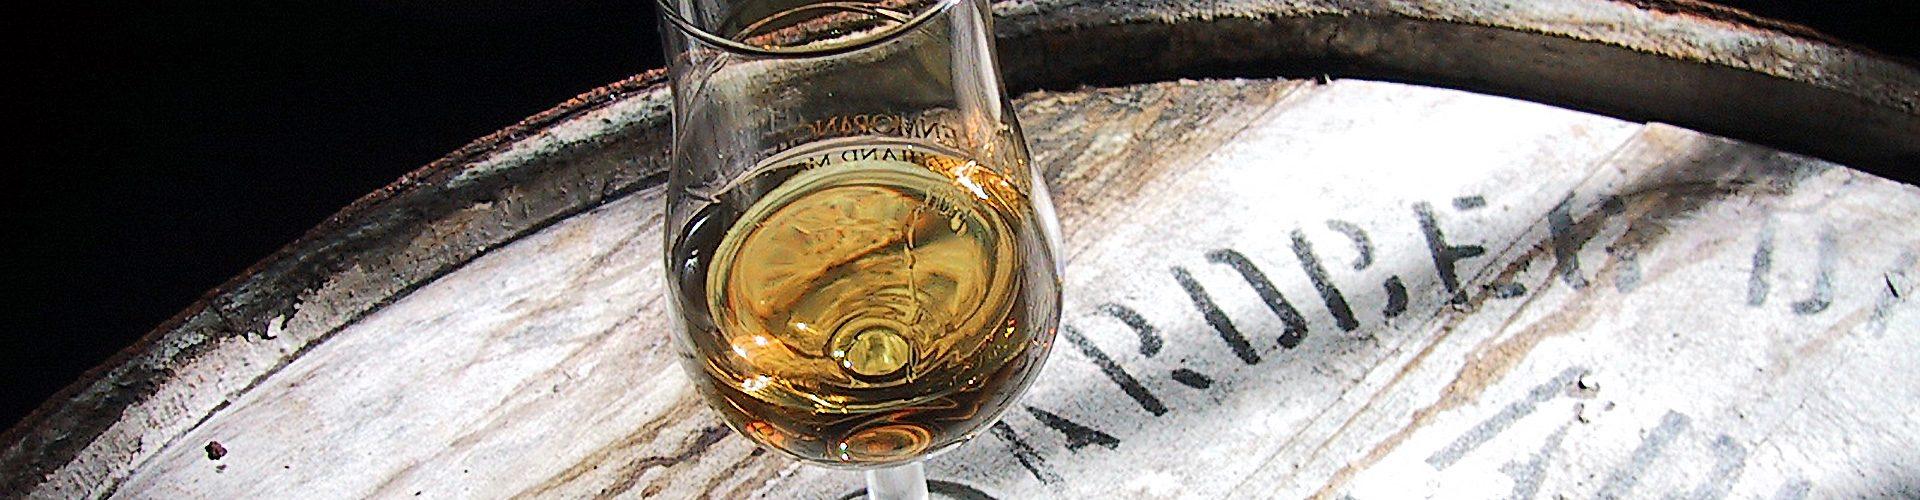 | Whisky Evenings | whiskyevenings.pl